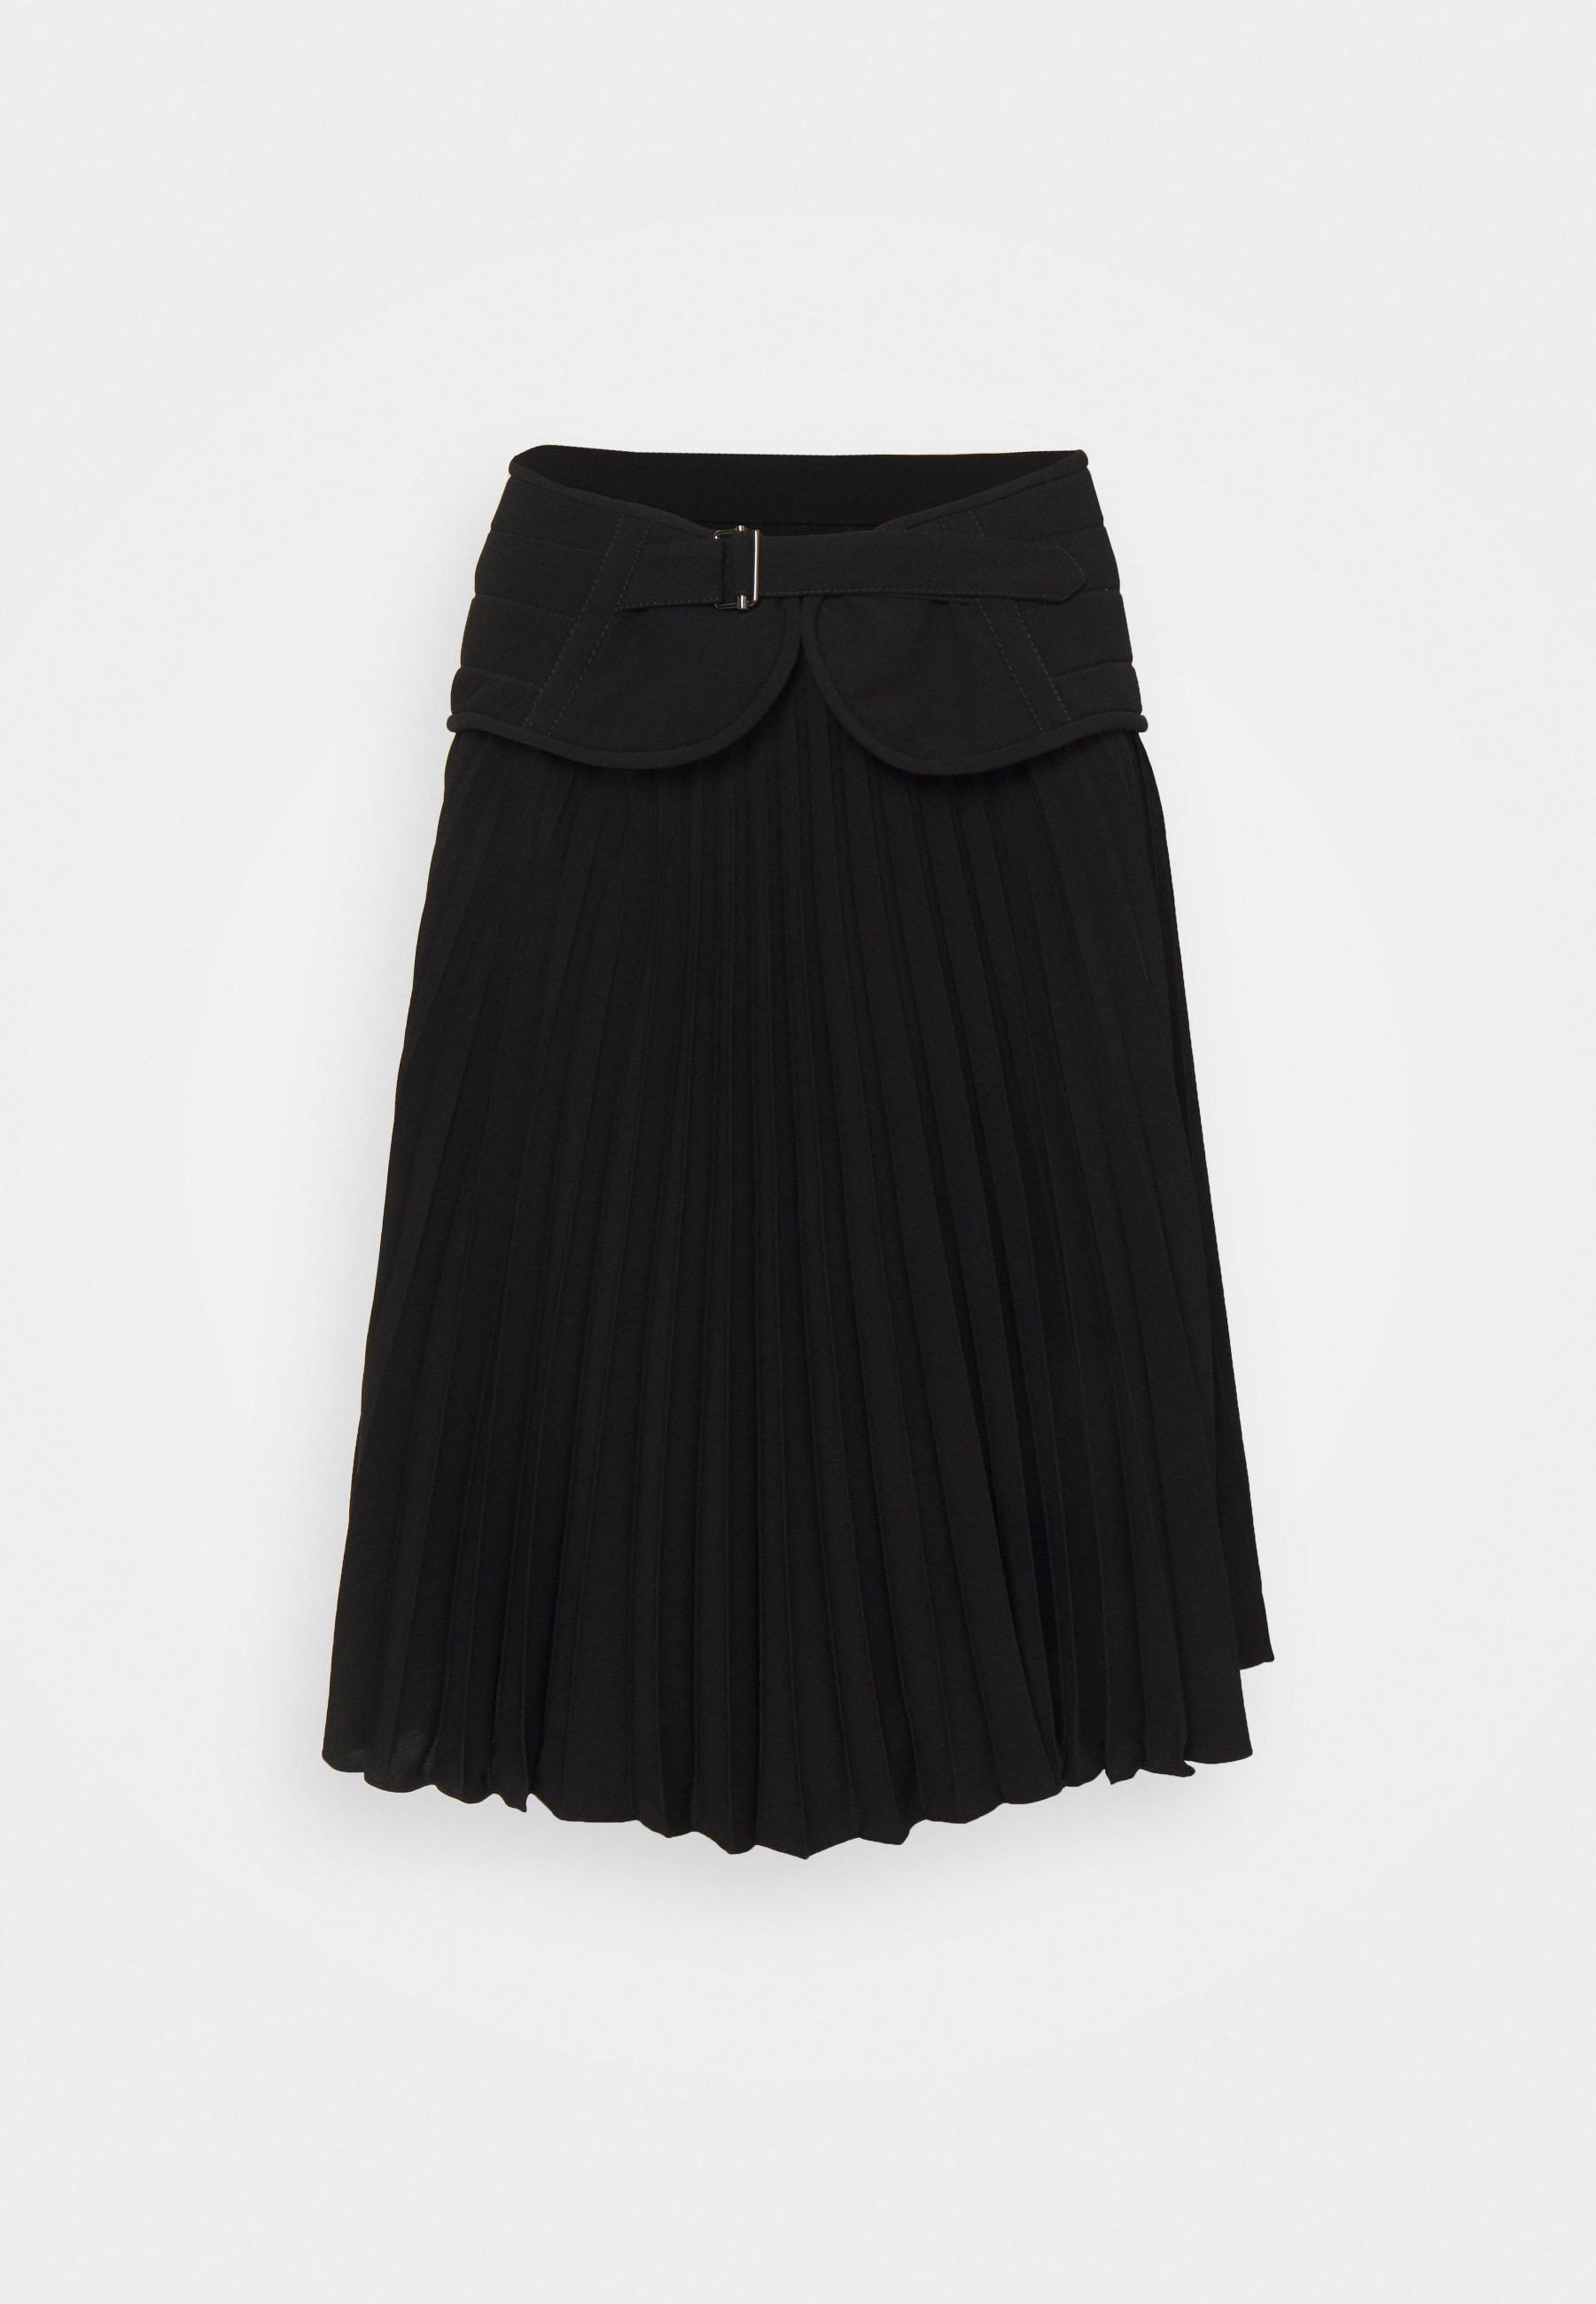 Femme SOLEIL PLEATED SKIRT WITH QUILTED BIKER BELT - Jupe plissée